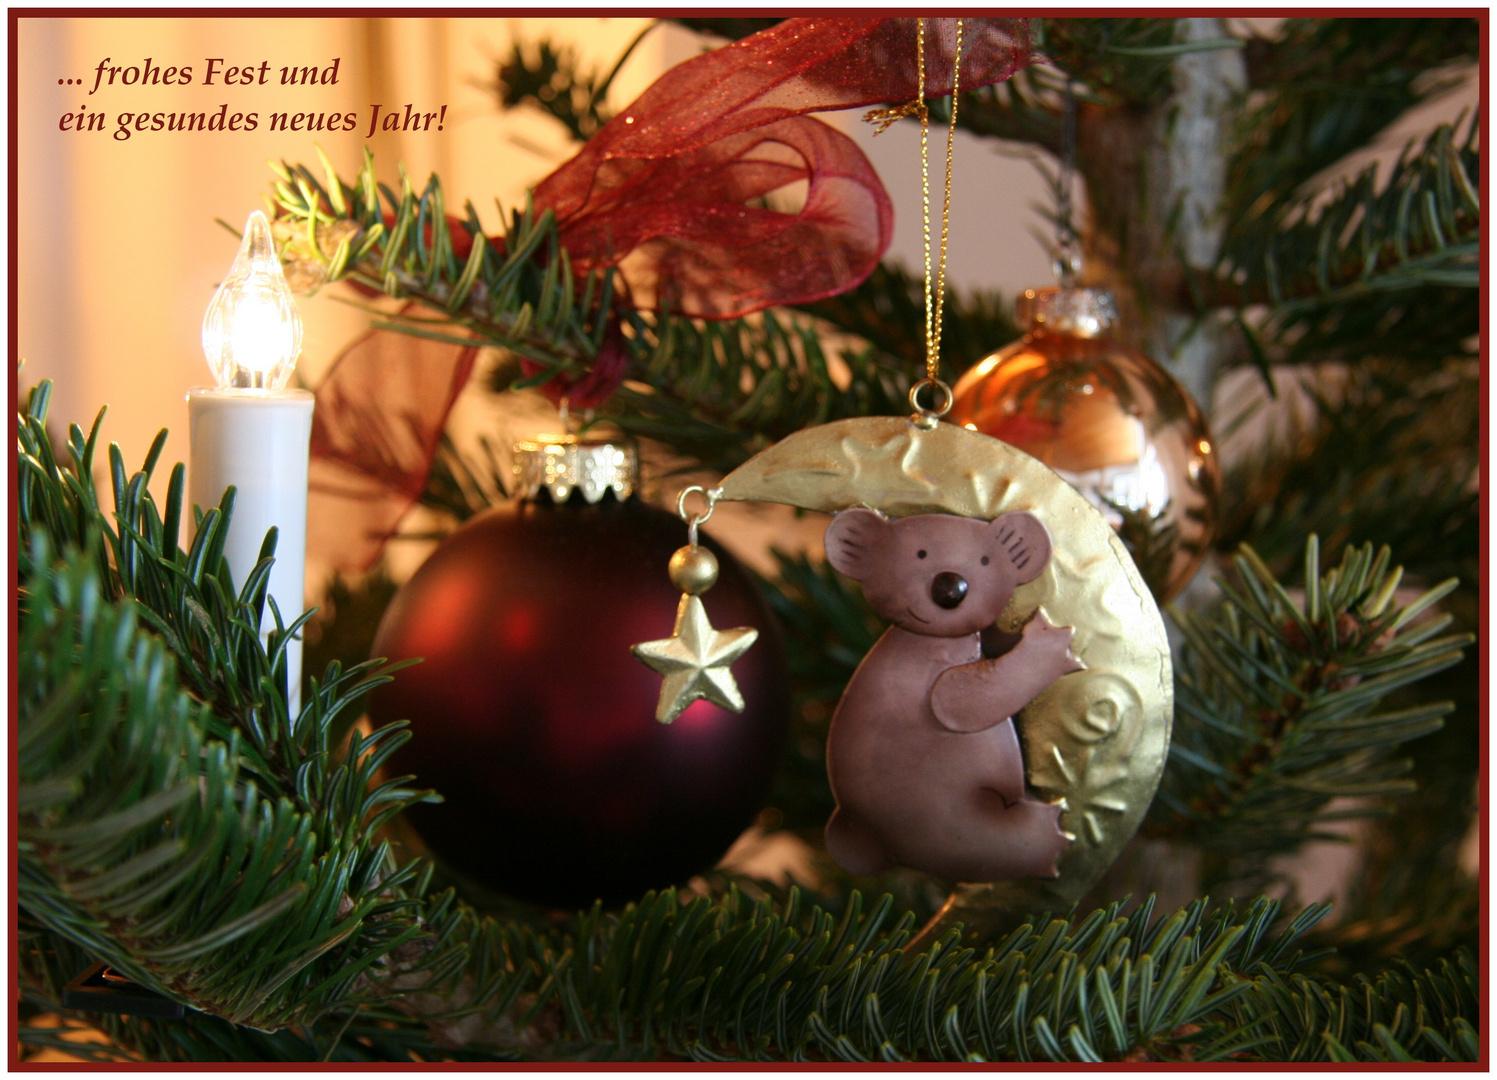 frohes Fest   oder der Koala im Christbaum ... ;)